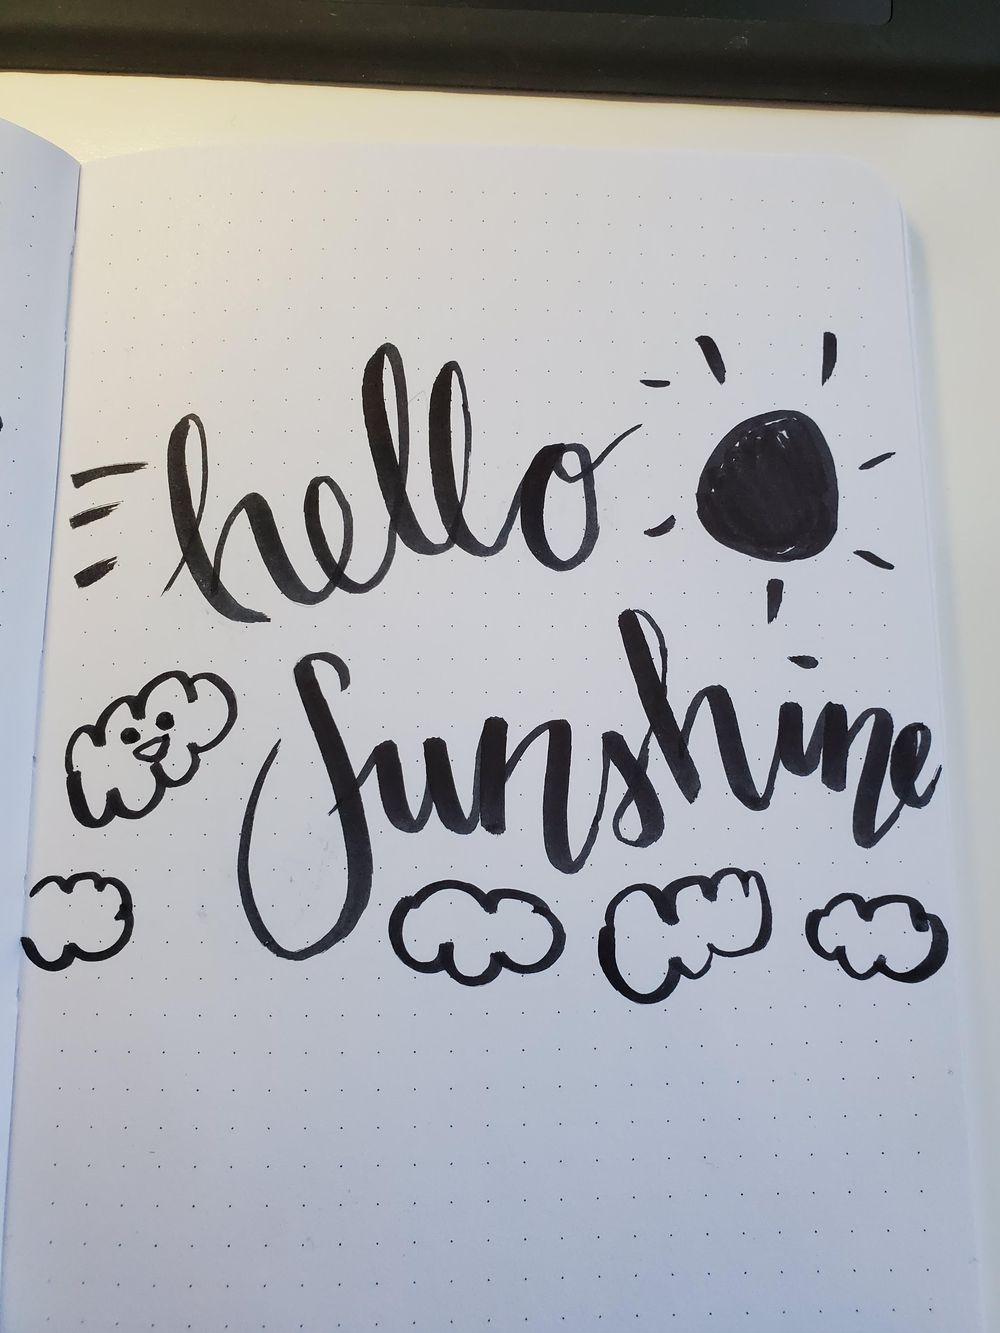 brush lettering basics - image 1 - student project